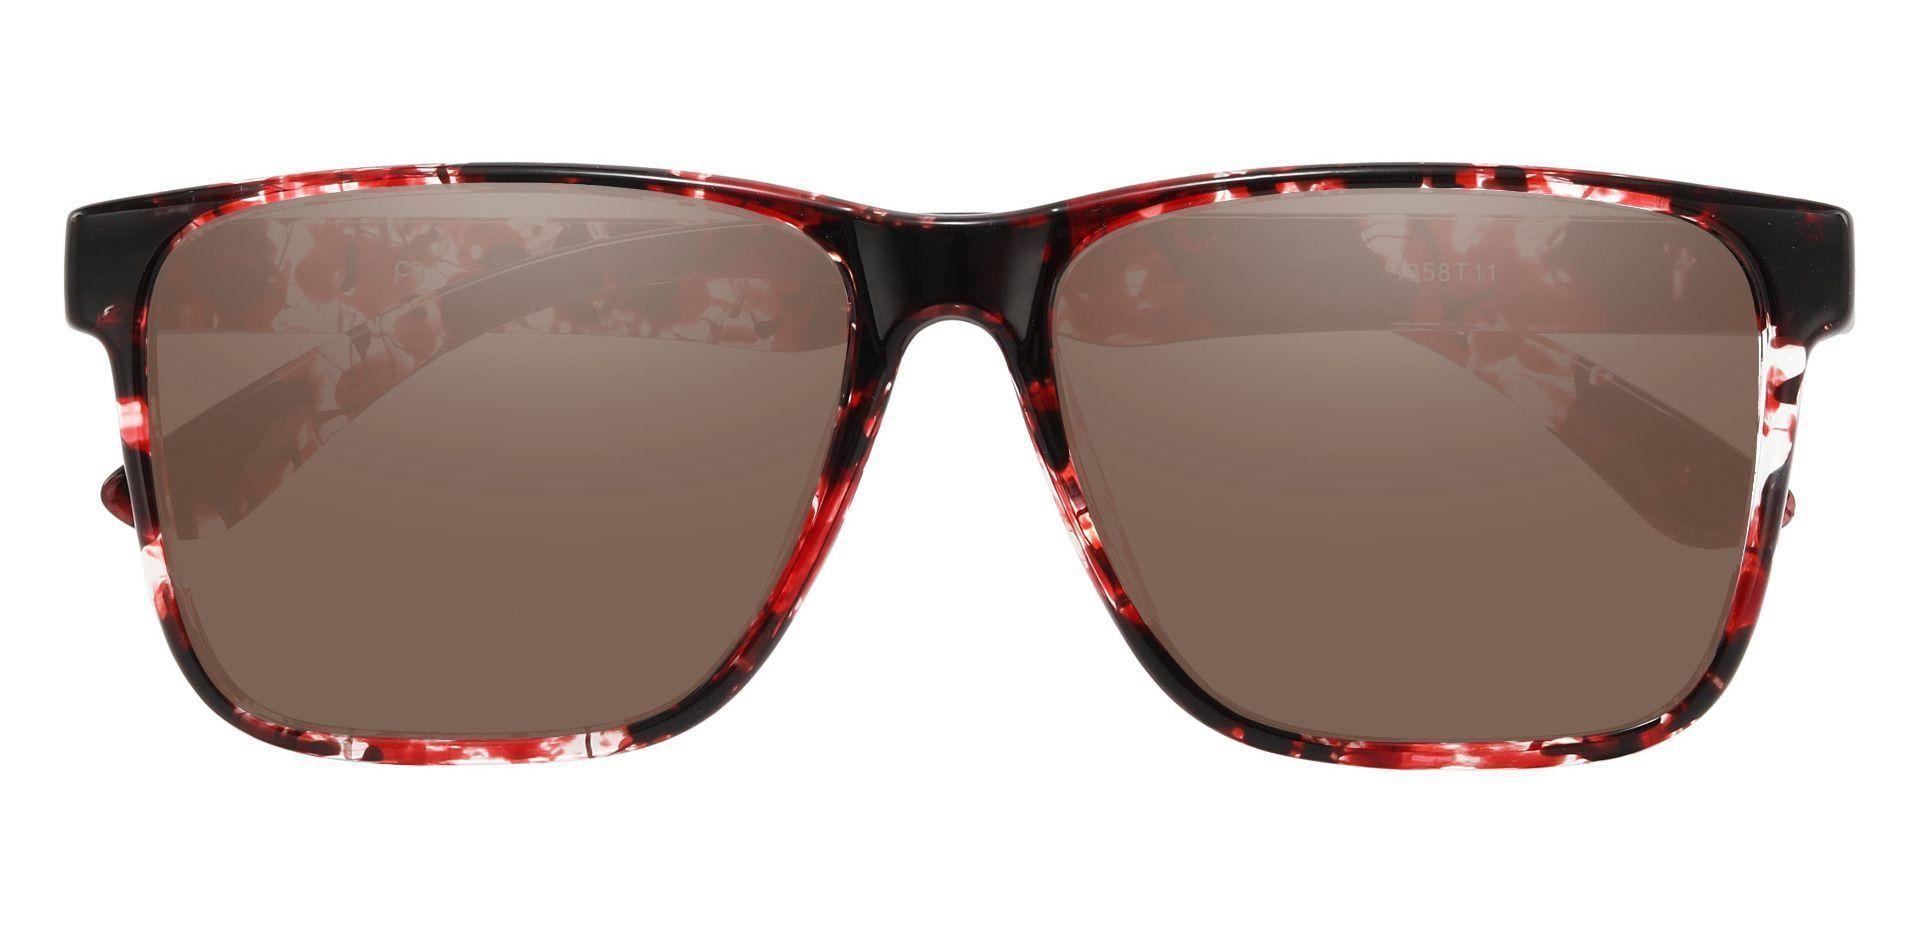 Barnum Square Prescription Sunglasses - Tortoise Frame With Brown Lenses